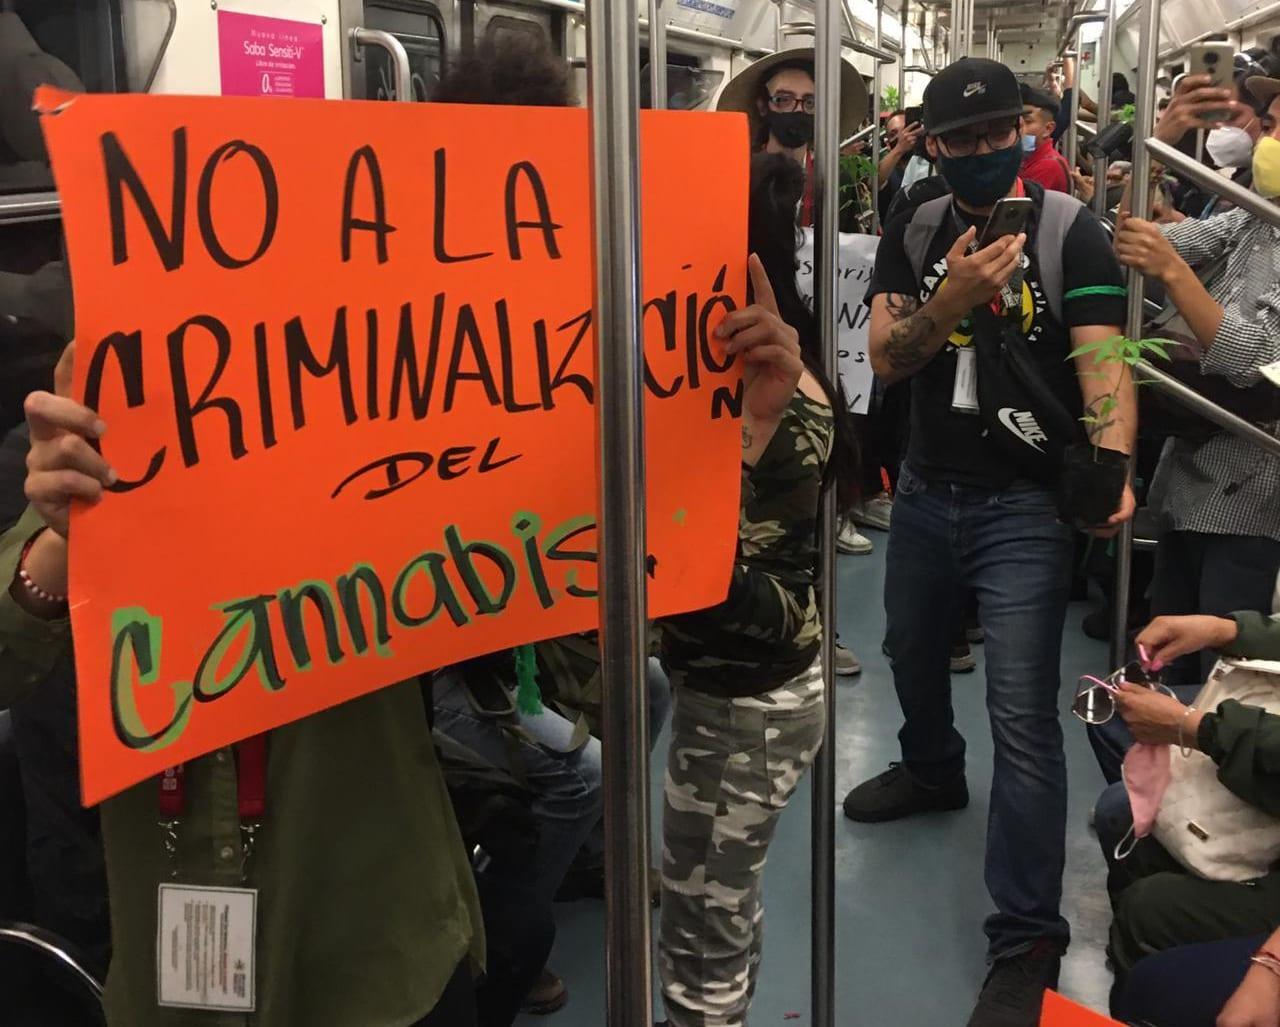 New cannabis bill a massive violation of human rights, Mexican activists say - Mexico City metro